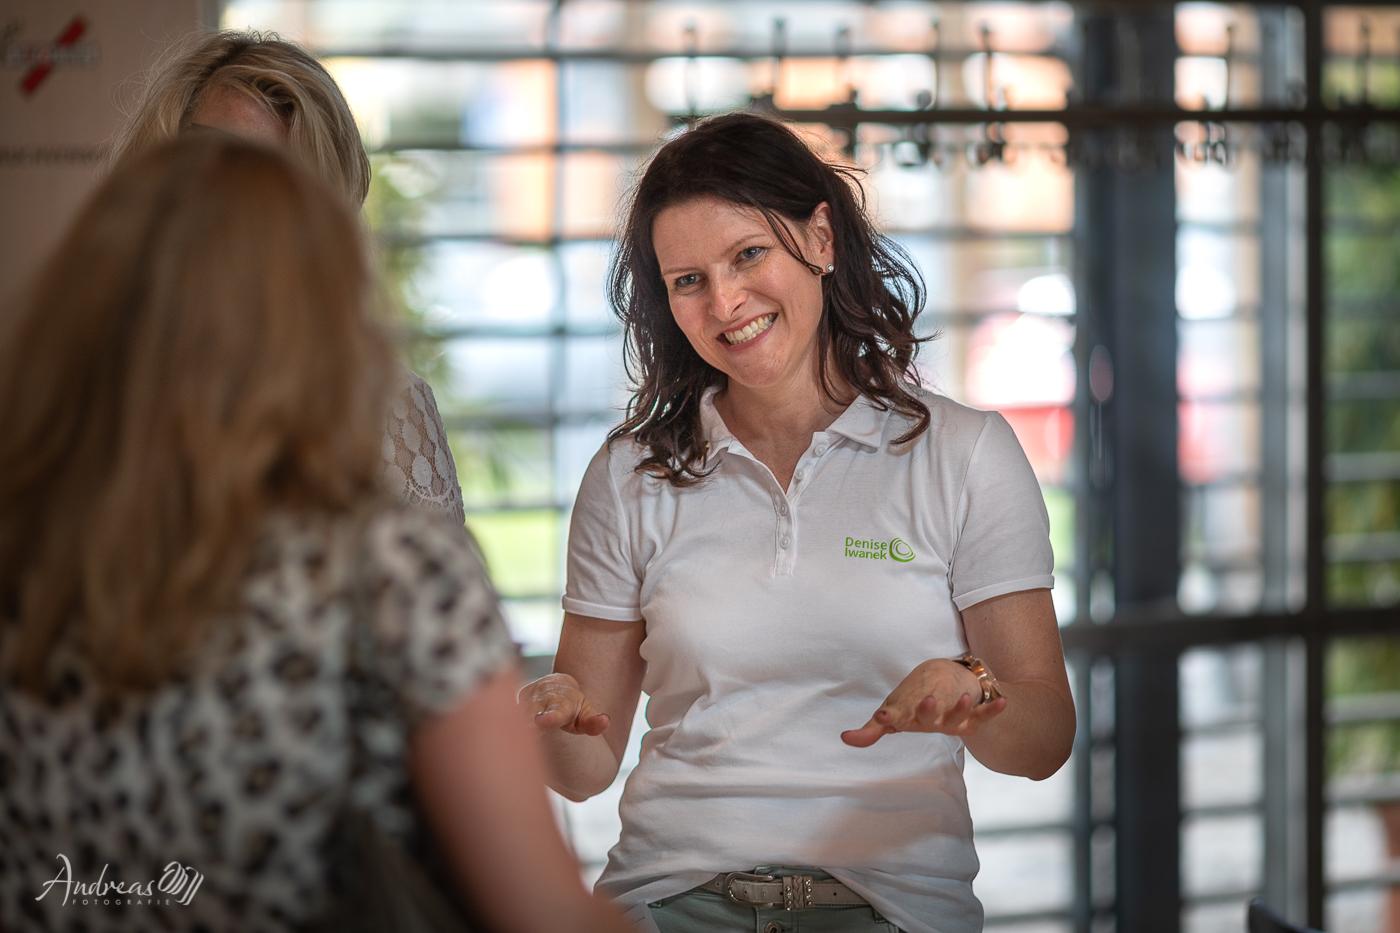 Expert Marketplace -  Denise Iwanek - Impressionen drei